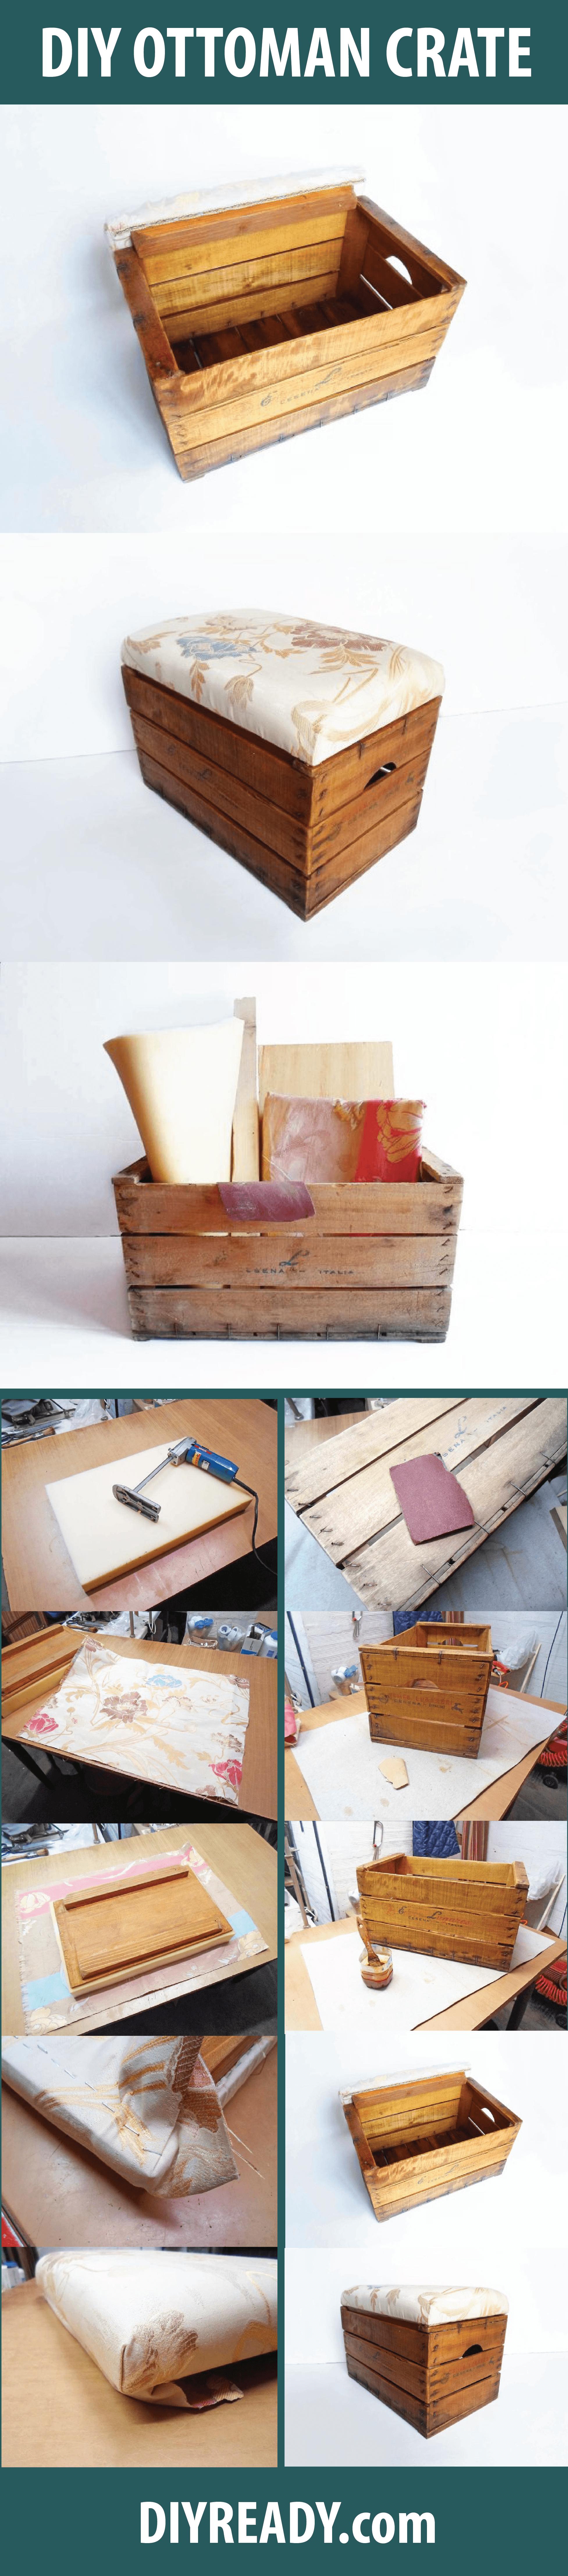 Upcycling Vintage Wooden Crate | Madera, Palets y Reciclado